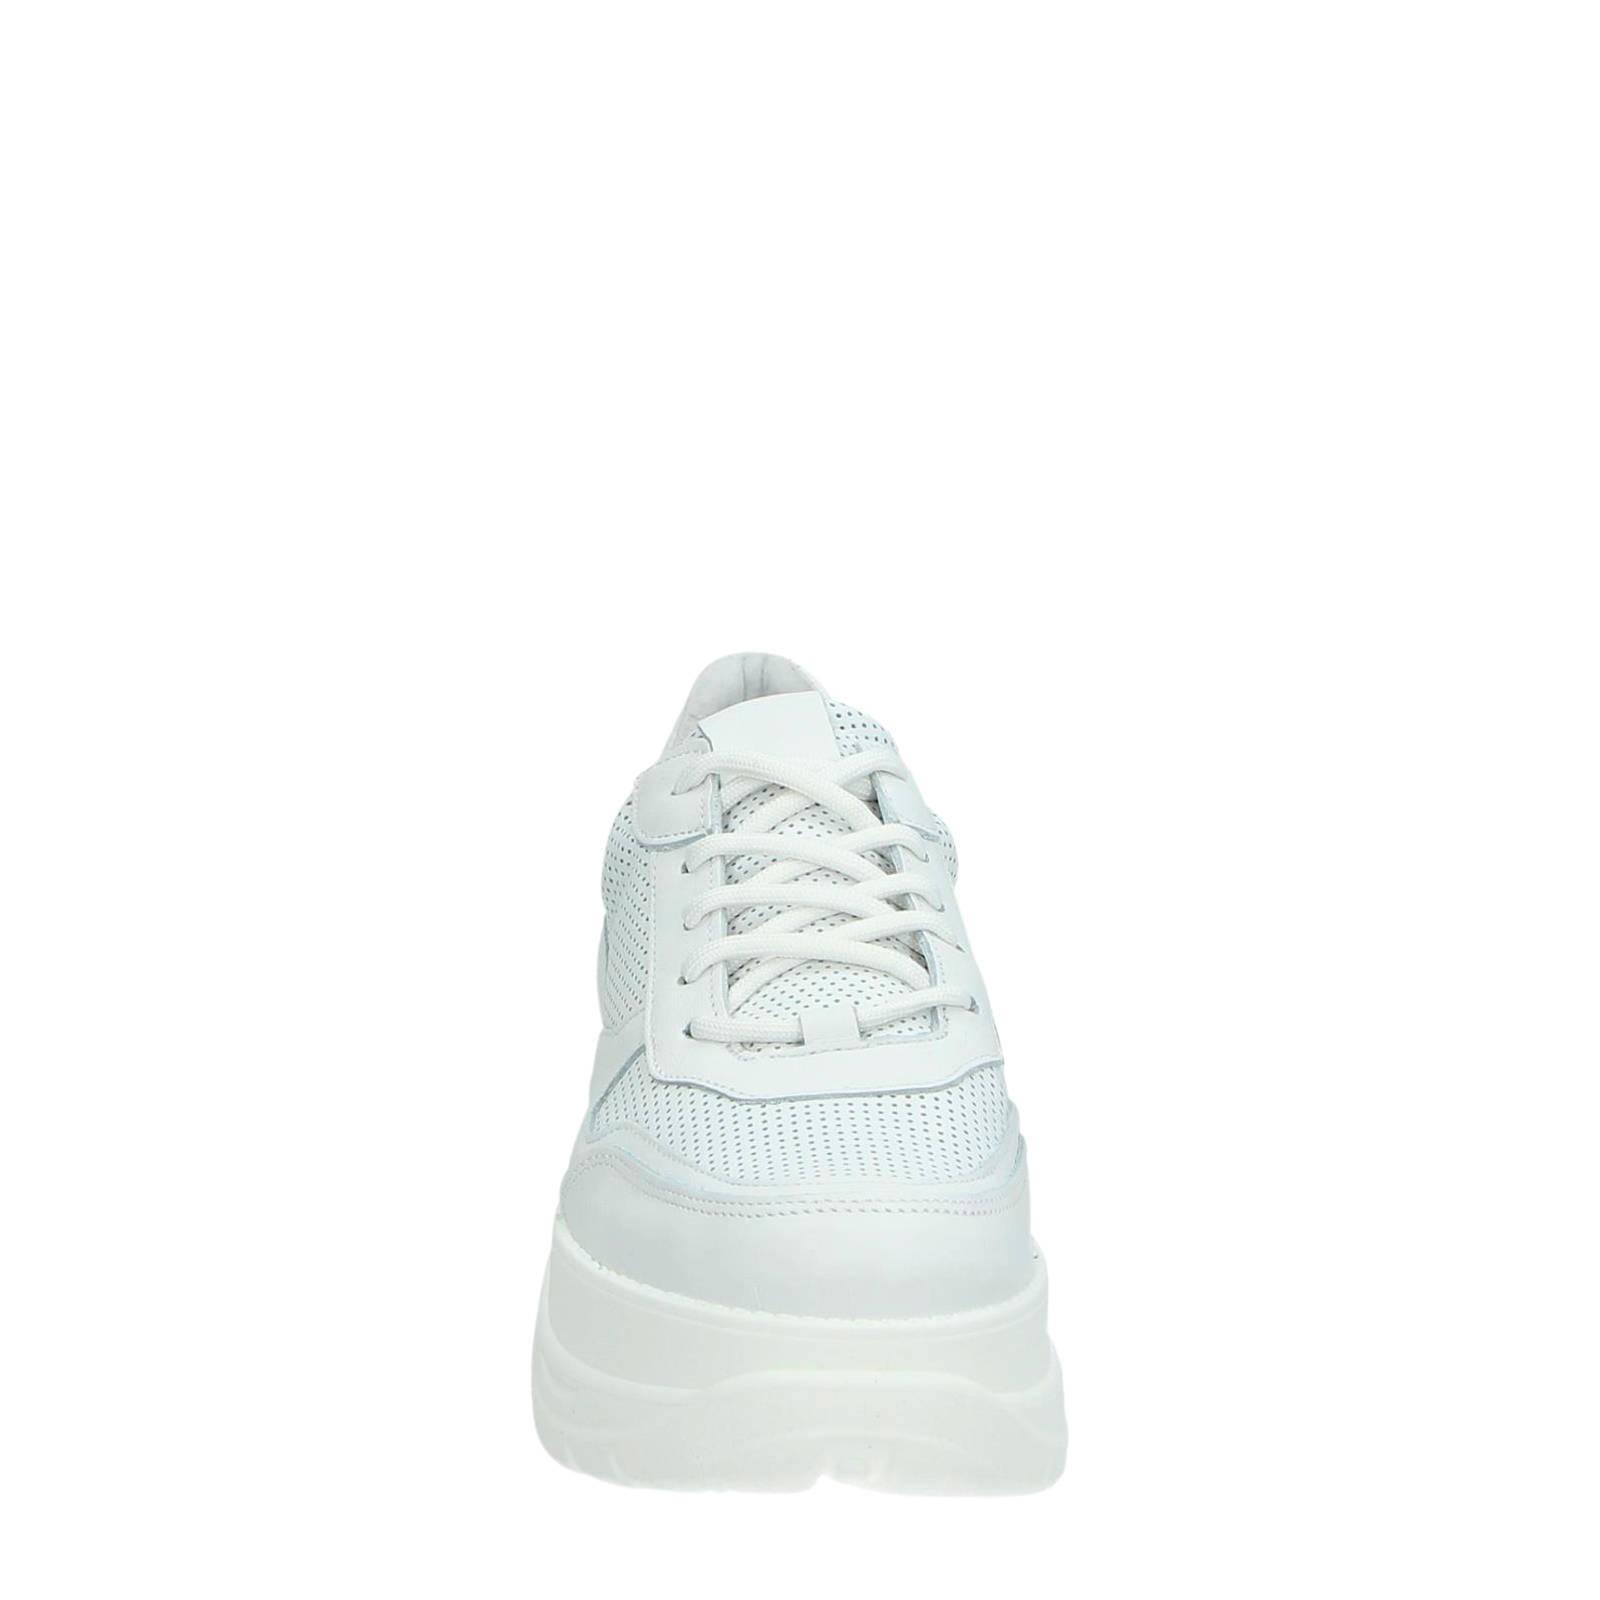 Steve Madden sneakers met hoge zool zwart | wehkamp